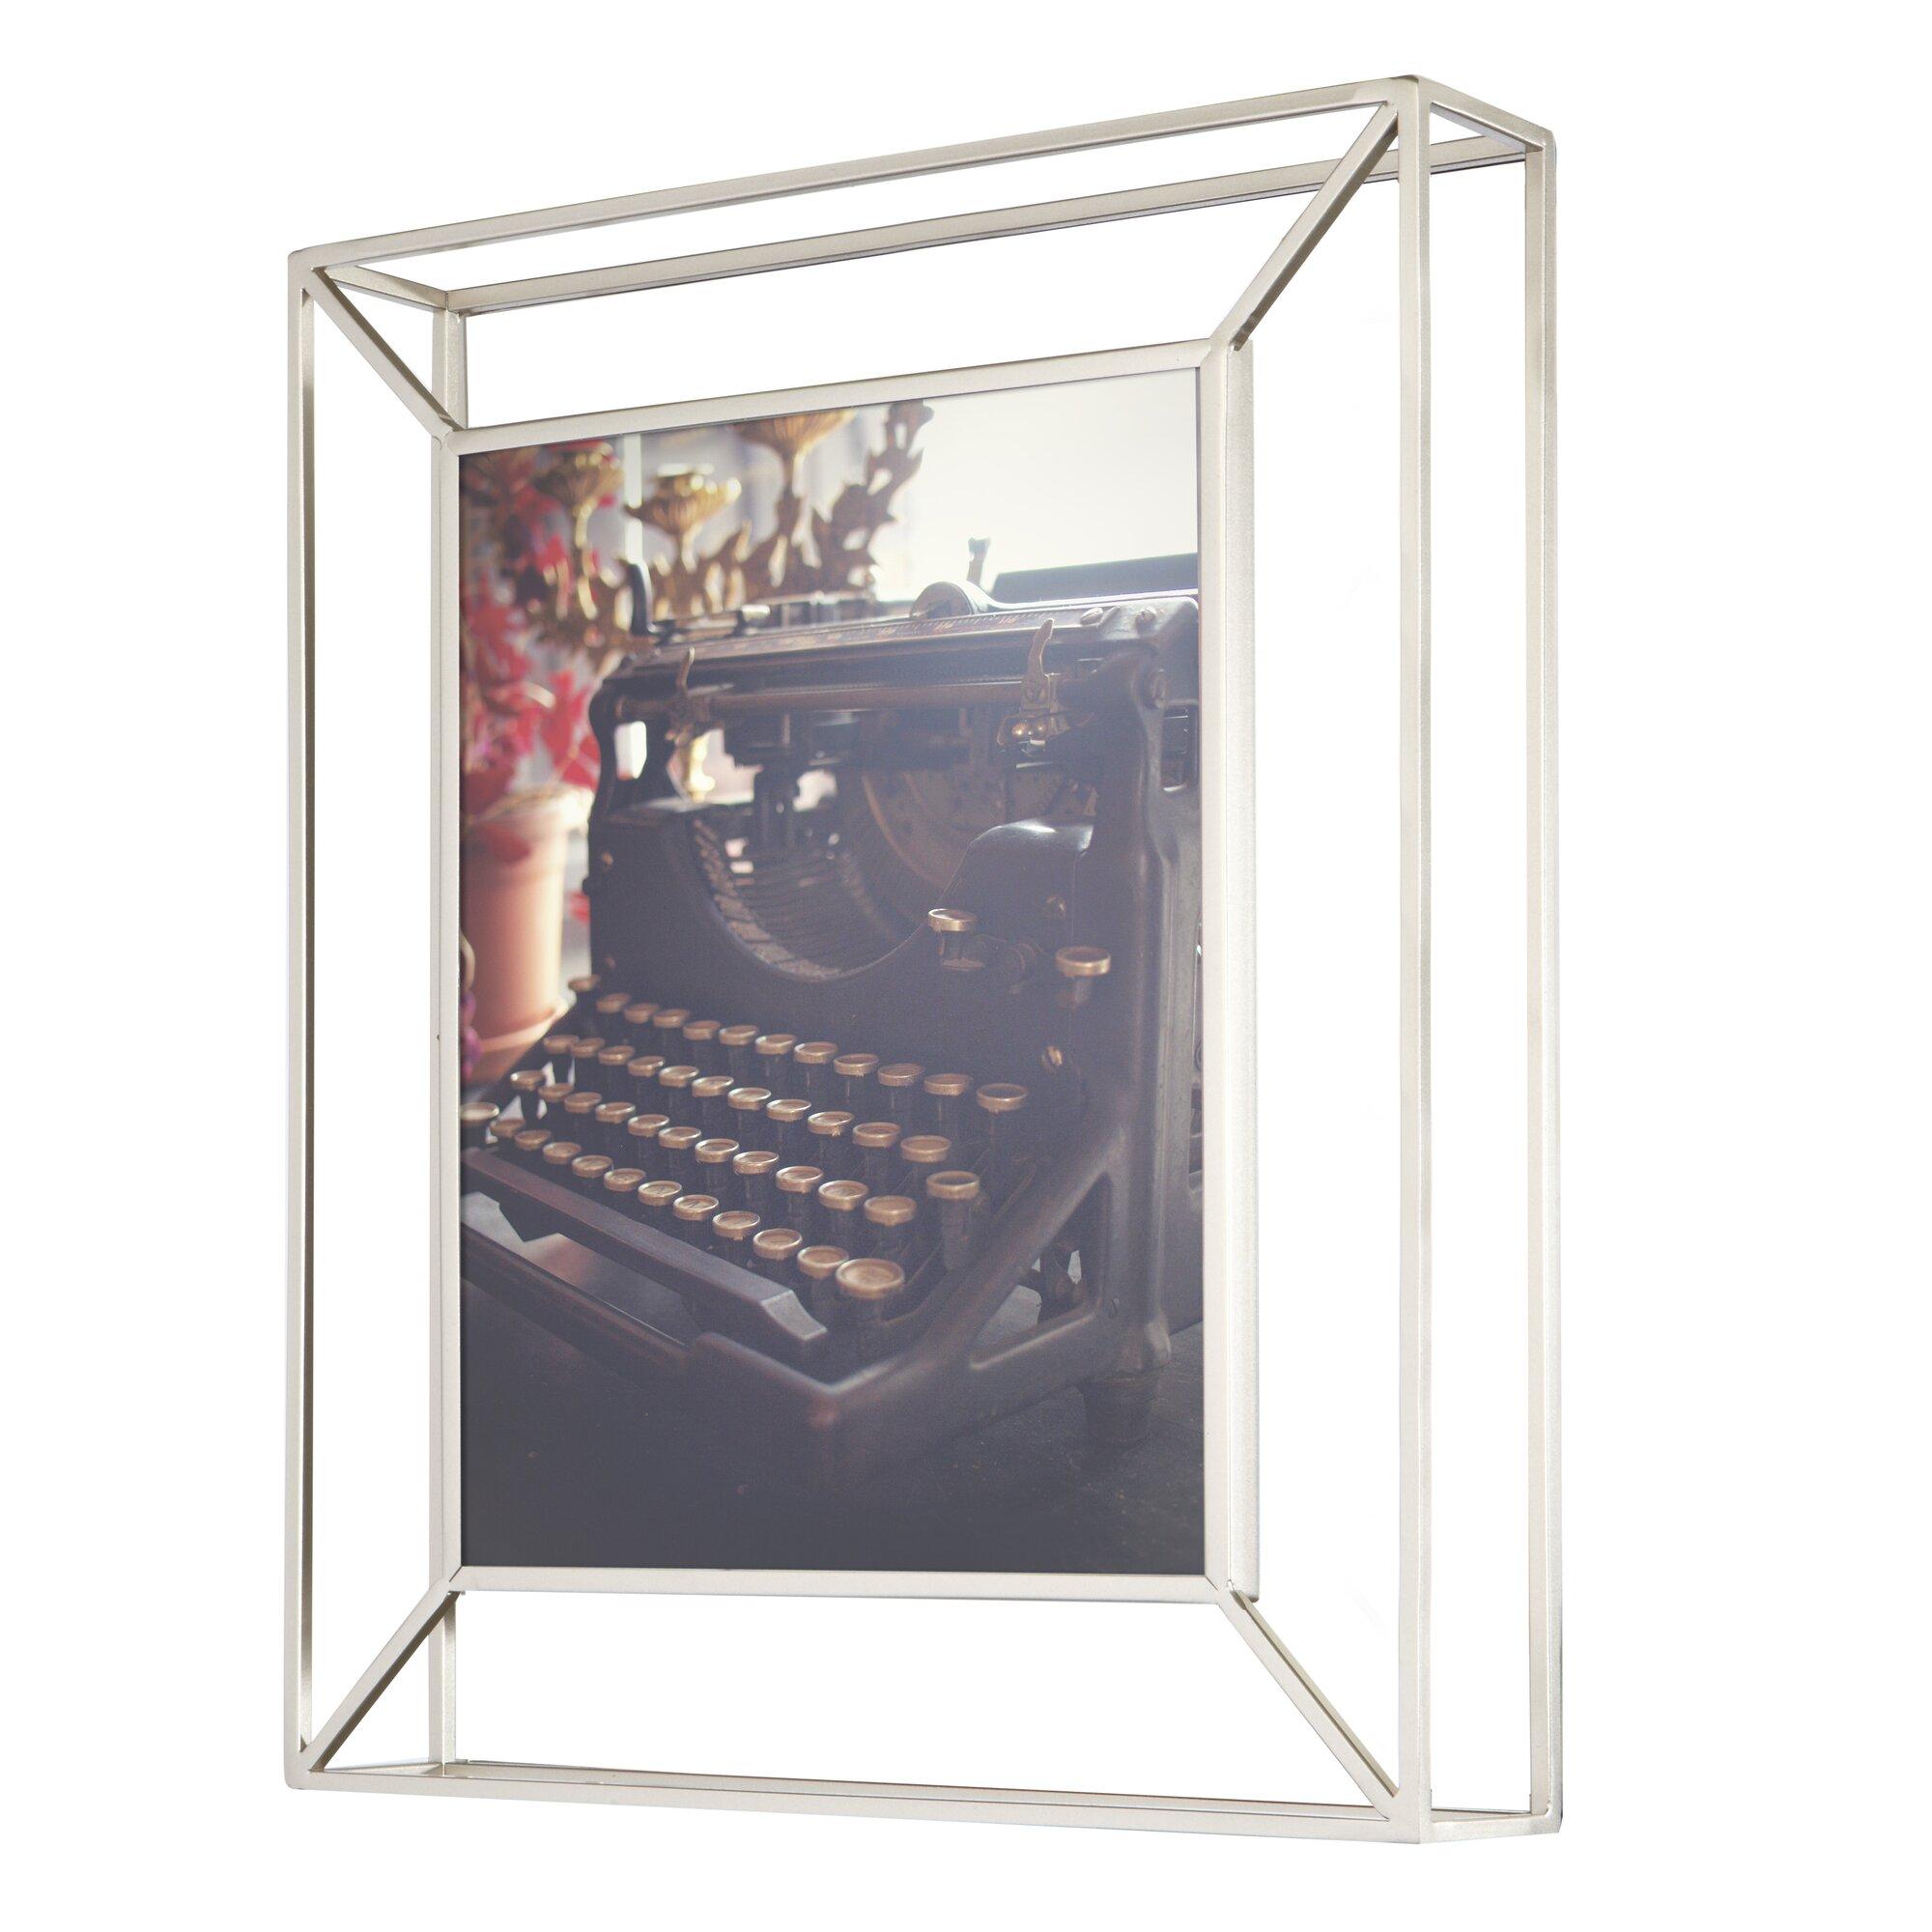 Umbra Matrix Photo Display Picture Frame & Reviews | Wayfair